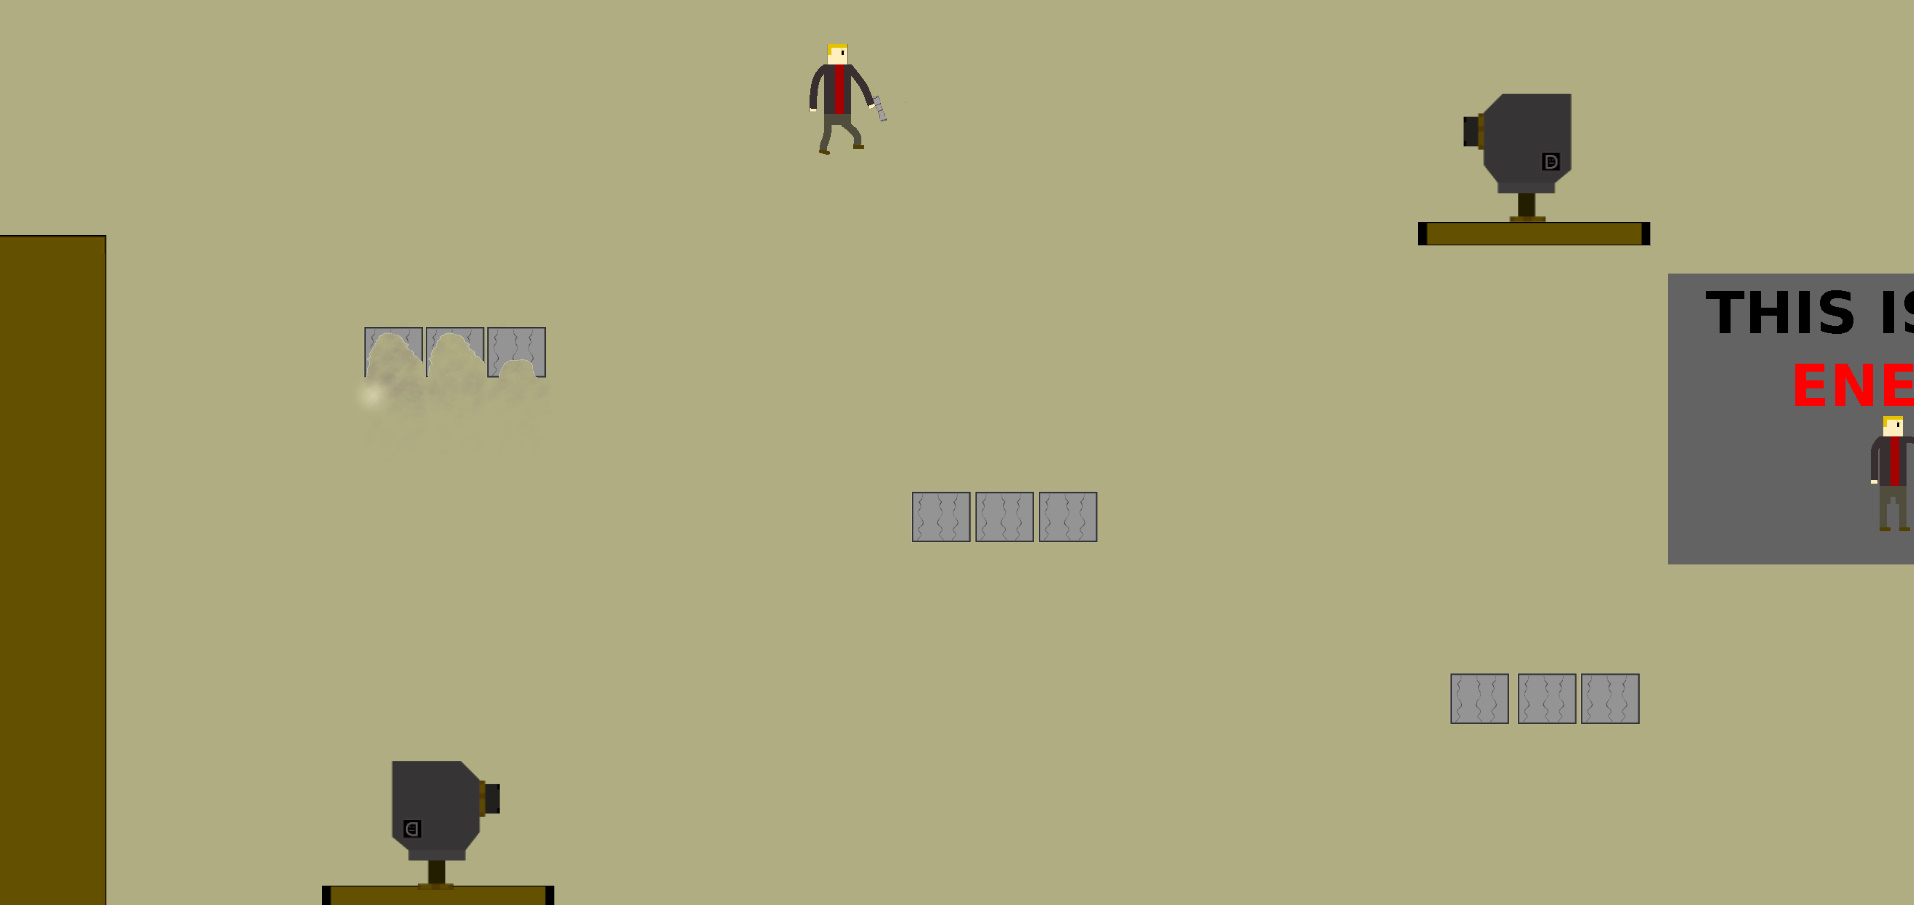 level 3_3 screen.jpg